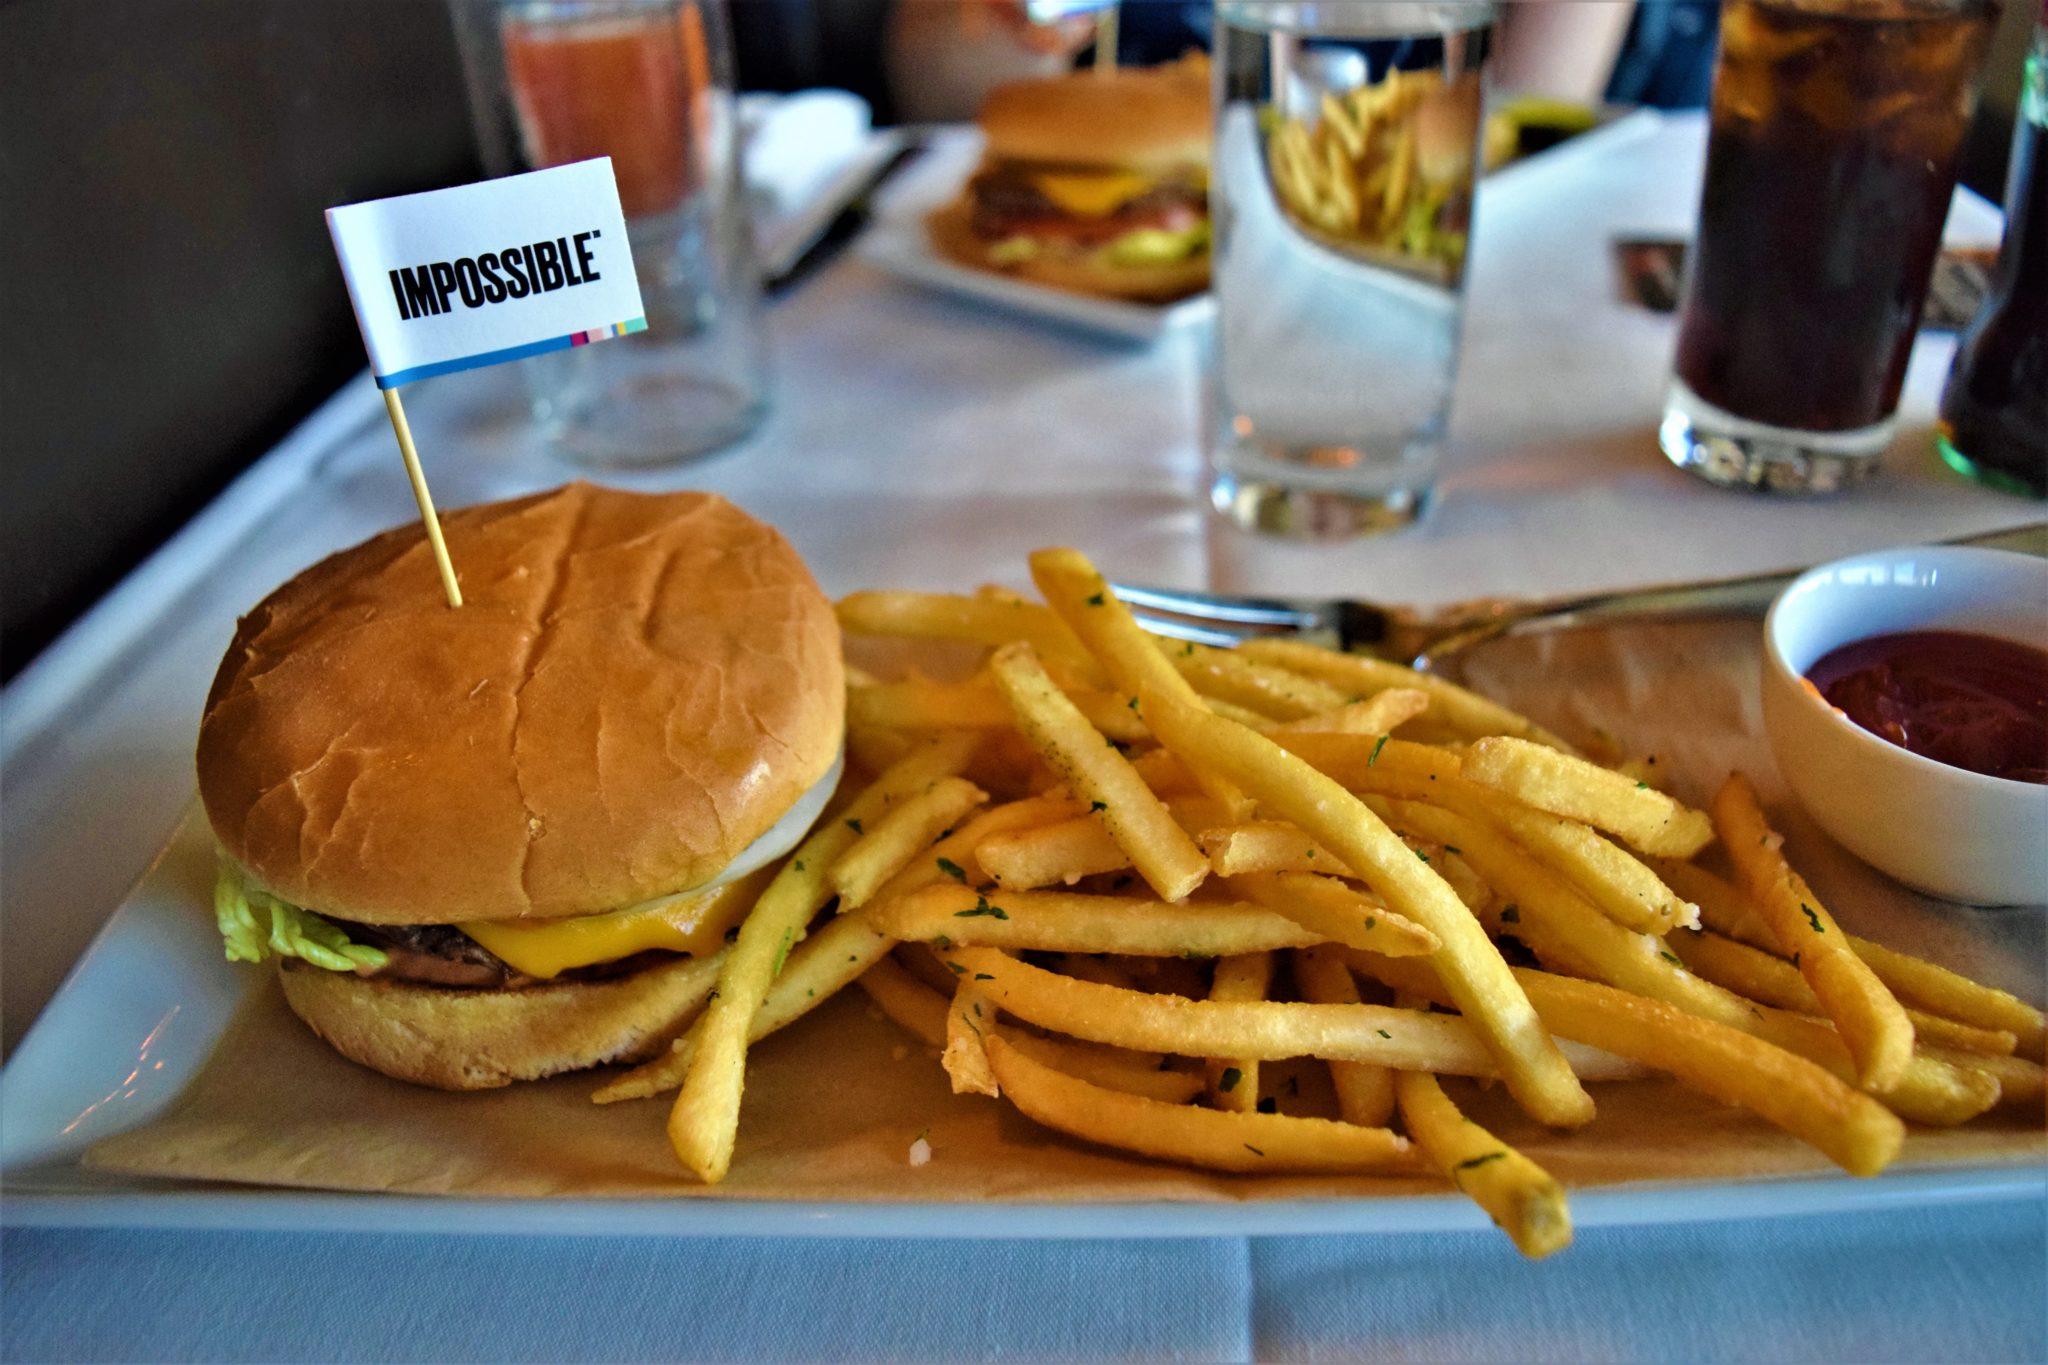 Impossible burger, Croosroads vegan kitchen, los angeles